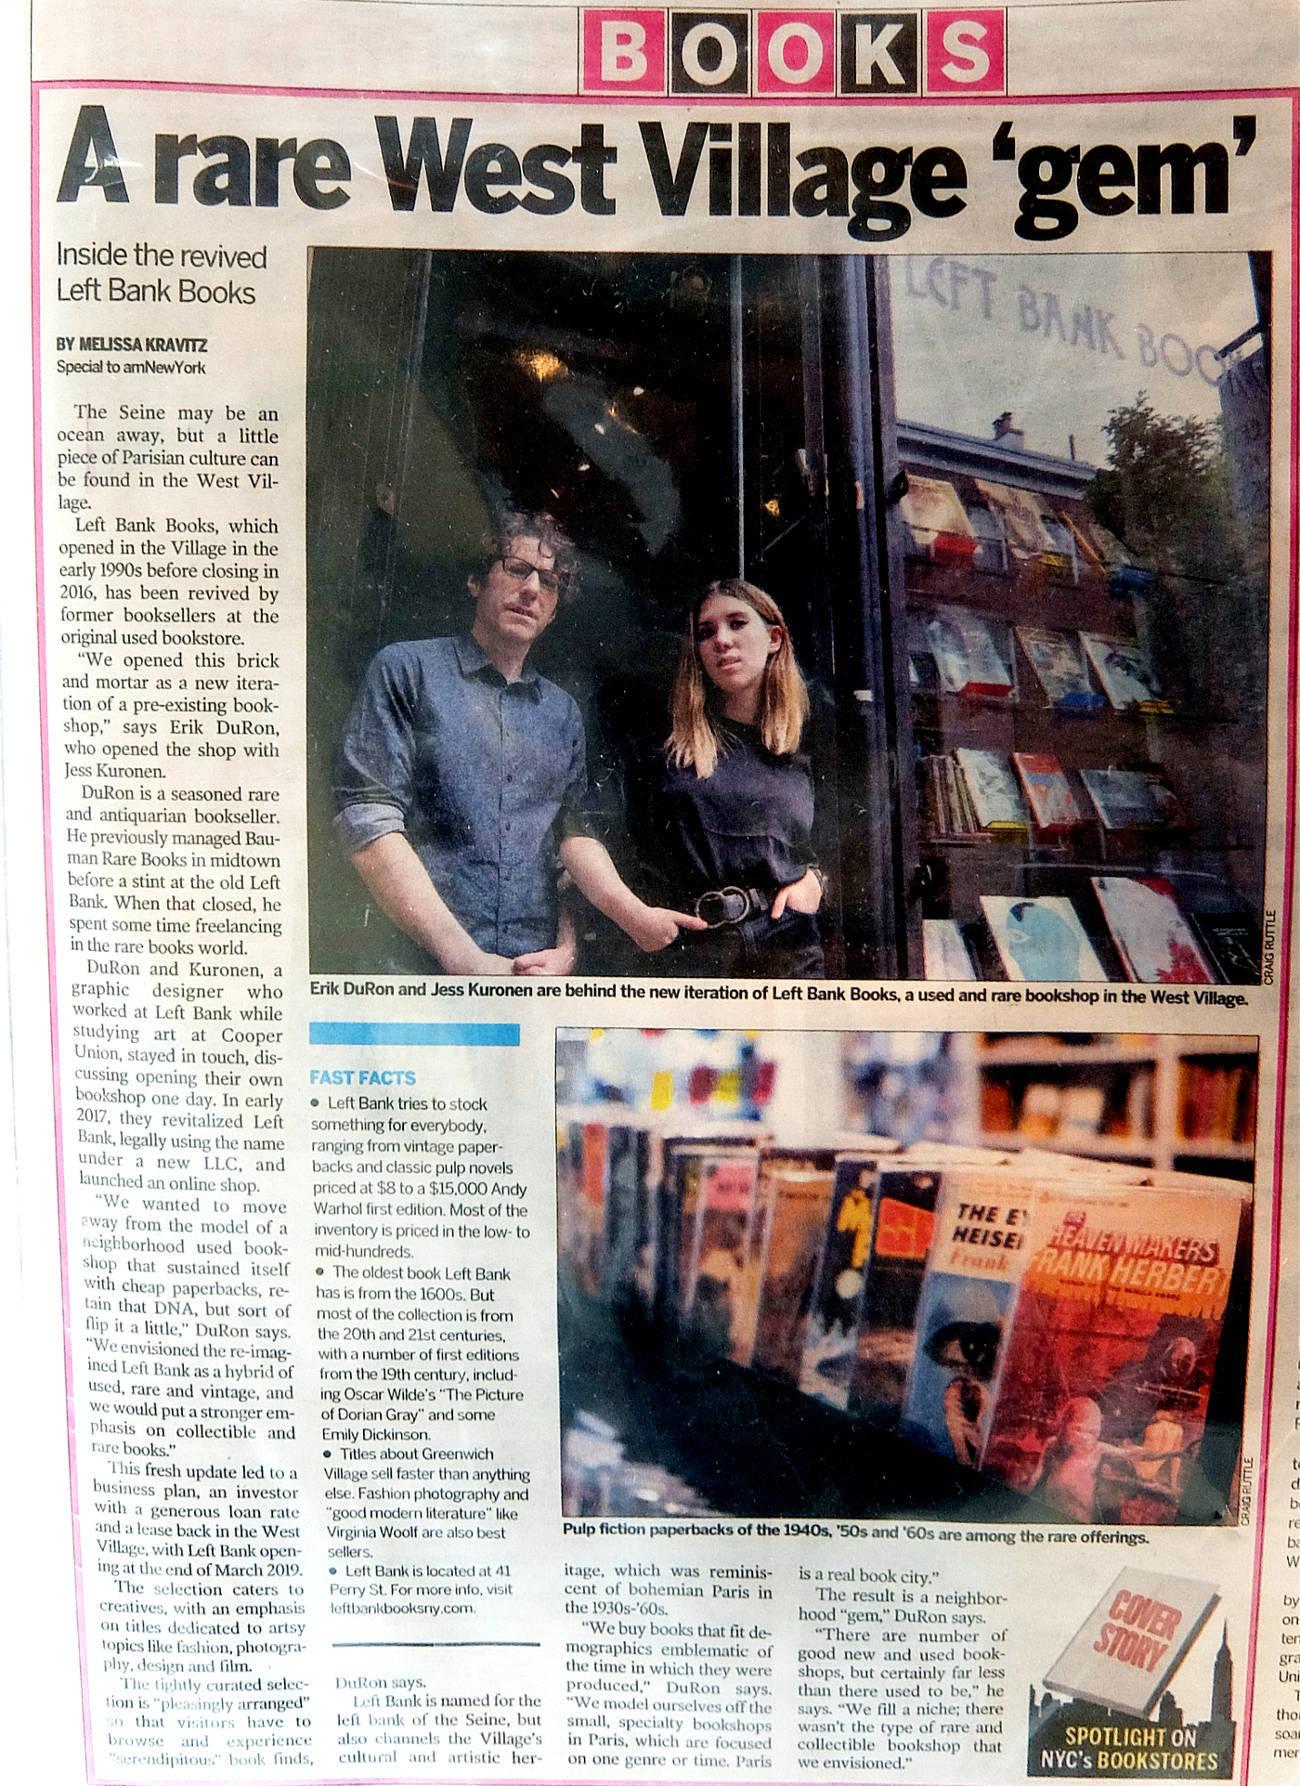 NYグリニッジ・ビレッジで復活した老舗書店、レフト・バンク・ブックス(Left Bank Books)_b0007805_08172596.jpg